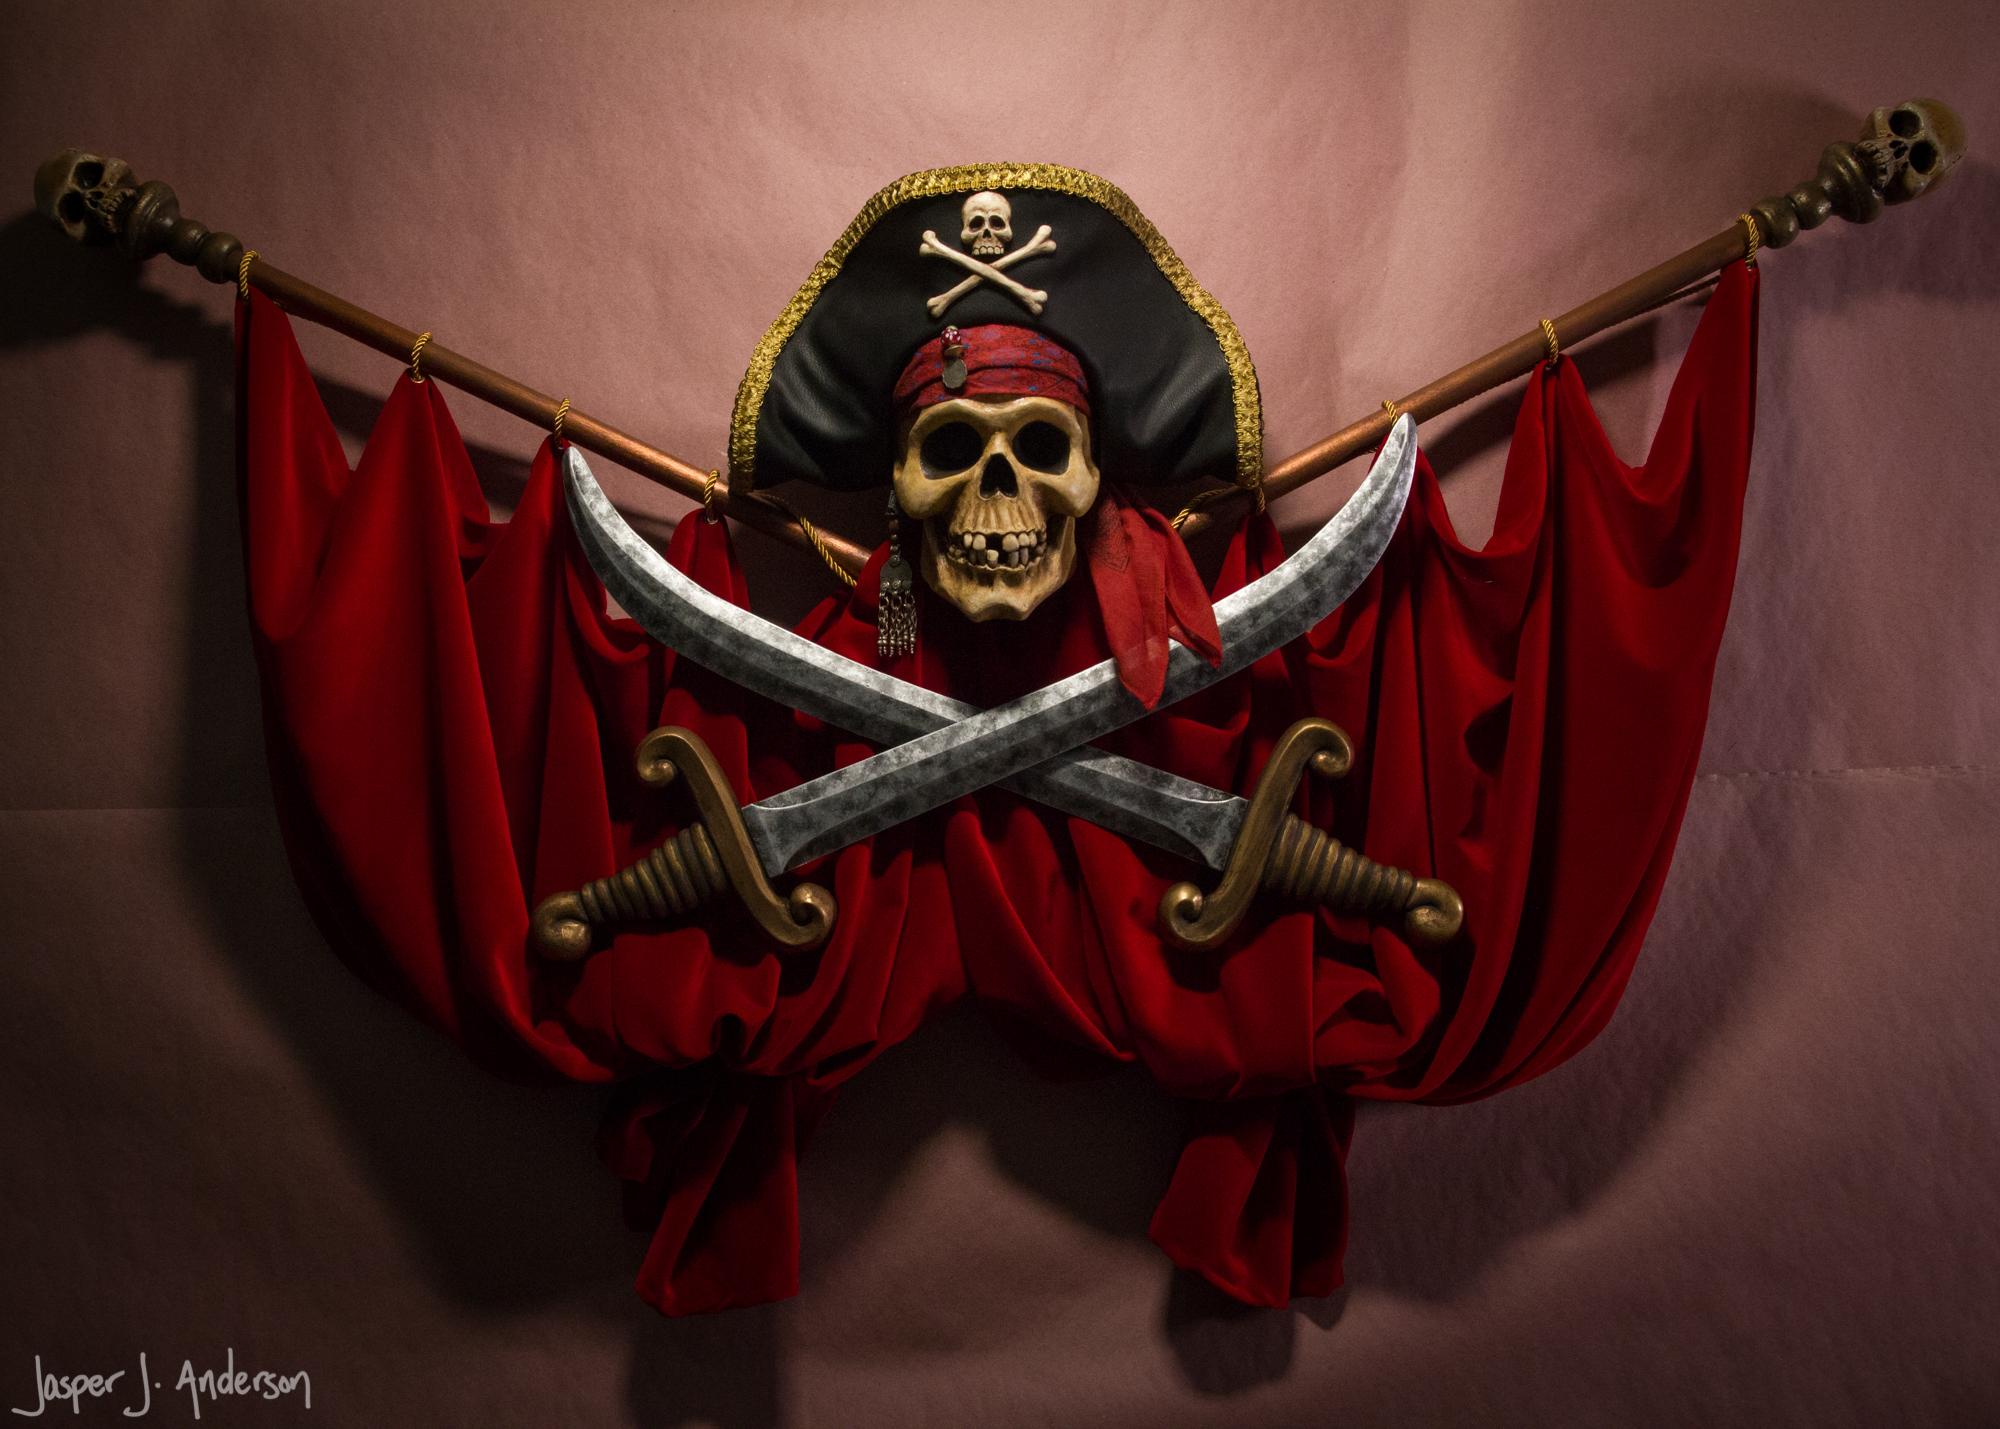 Modern Talking Pirate Skull-0048-2.jpg